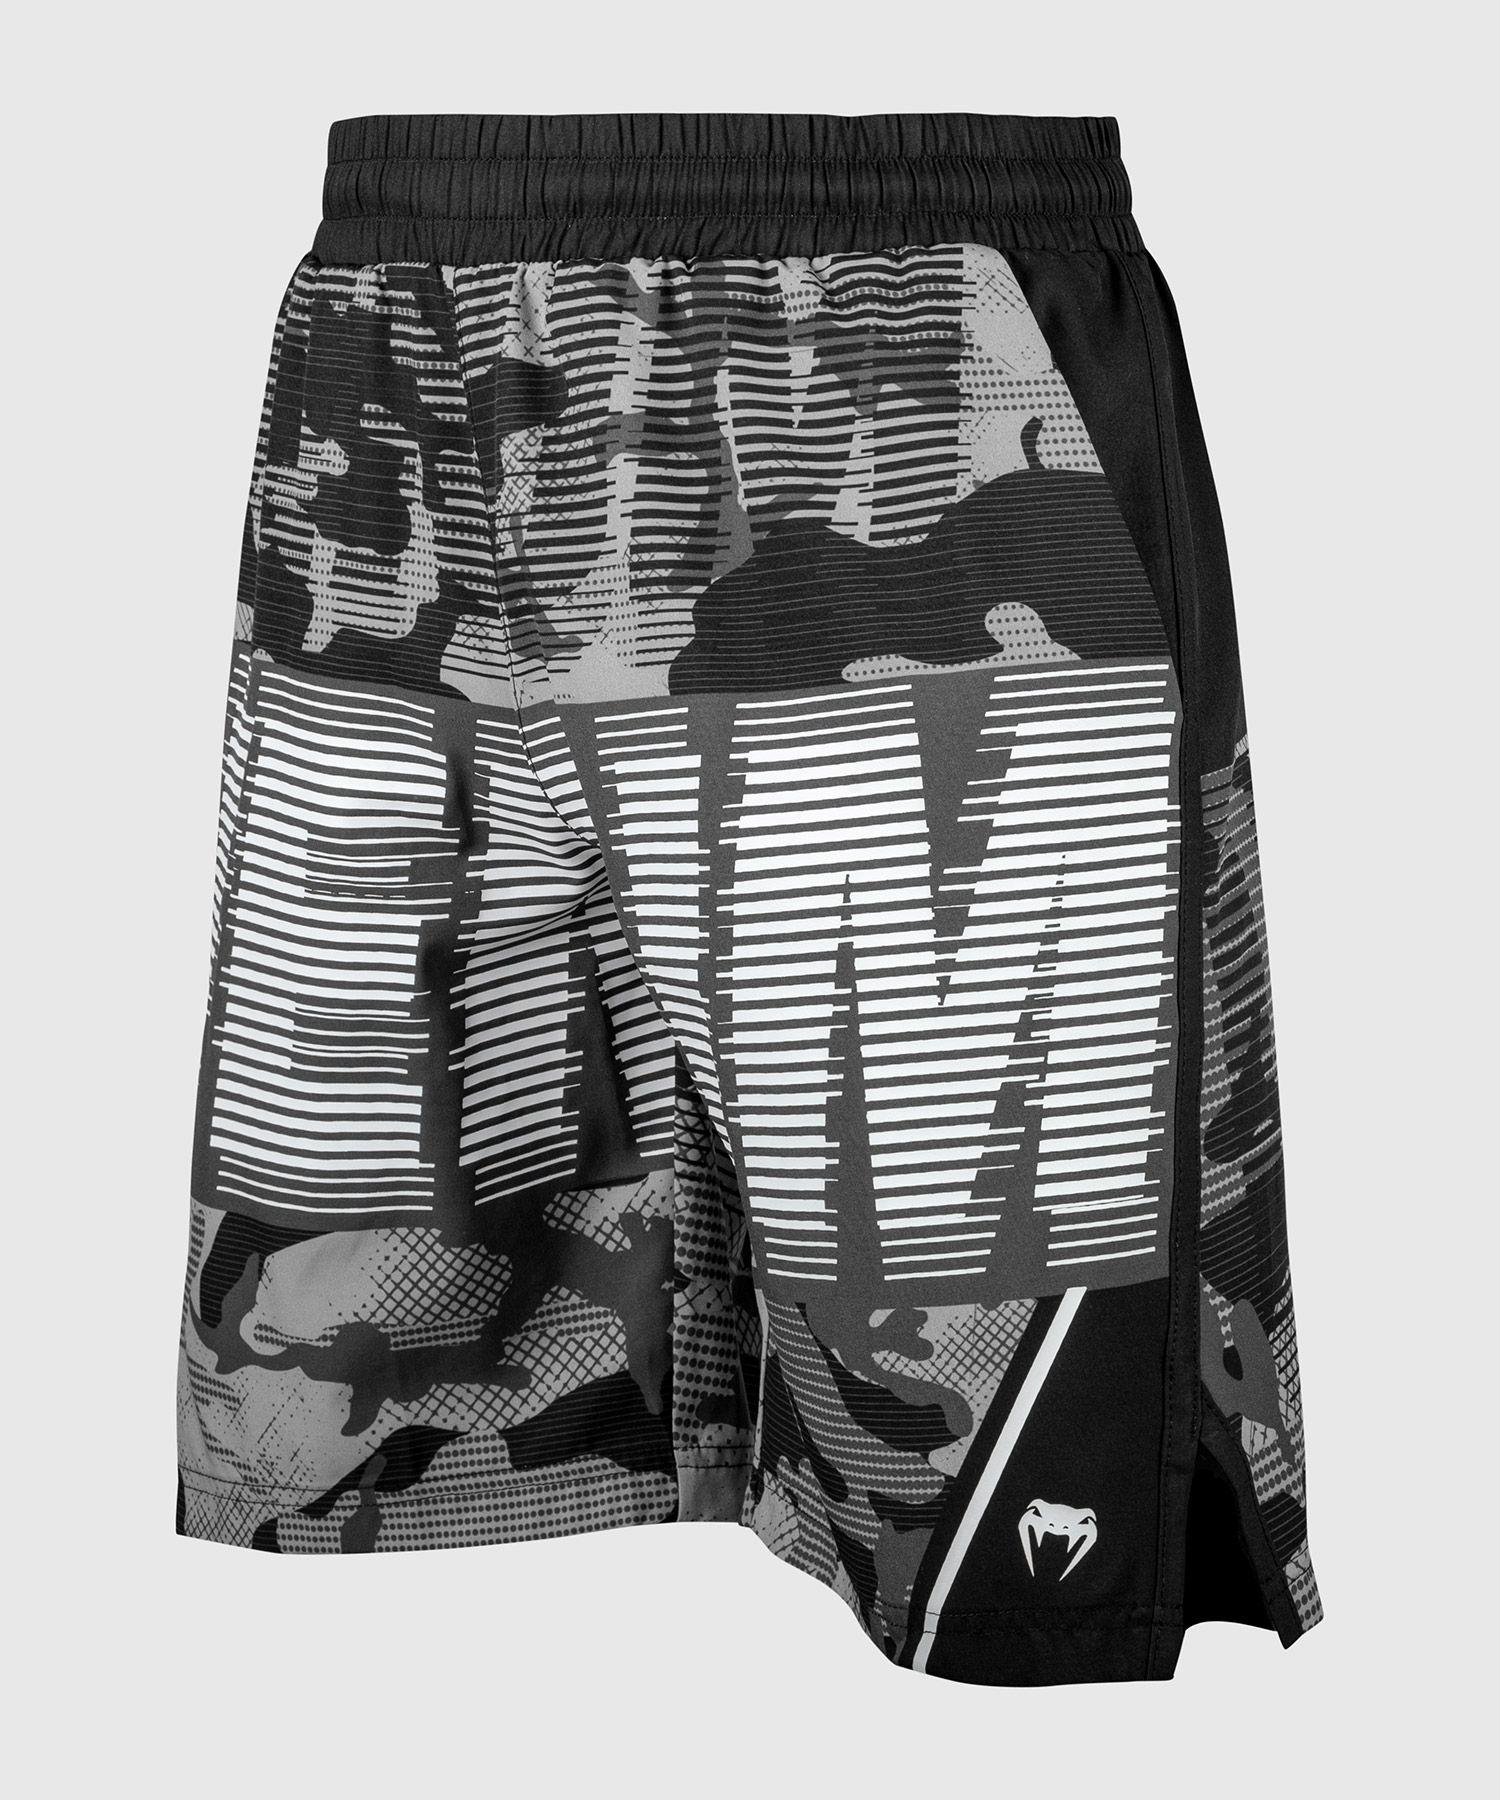 Venum Tactical Trainingshort - Urban Camouflage/Zwart